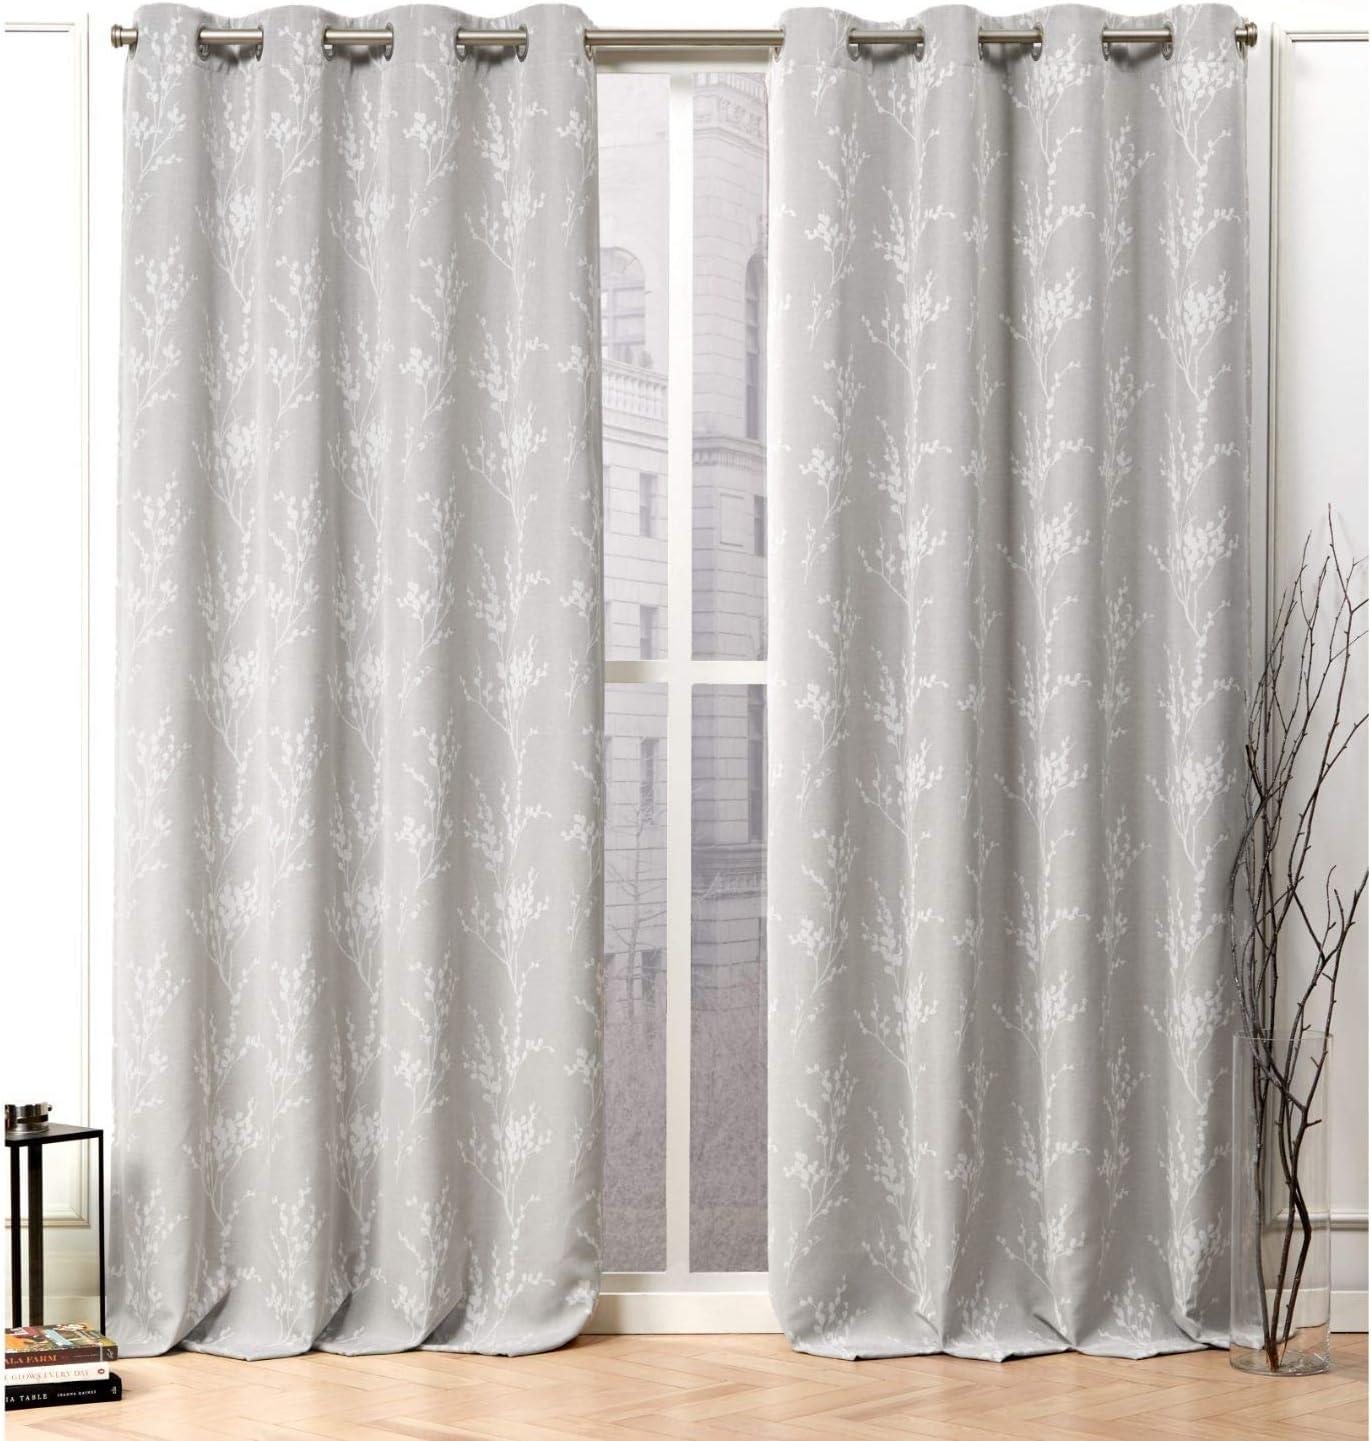 Nicole Miller Turion Curtain Panel, 52x84, Dove Grey, 2 Panels